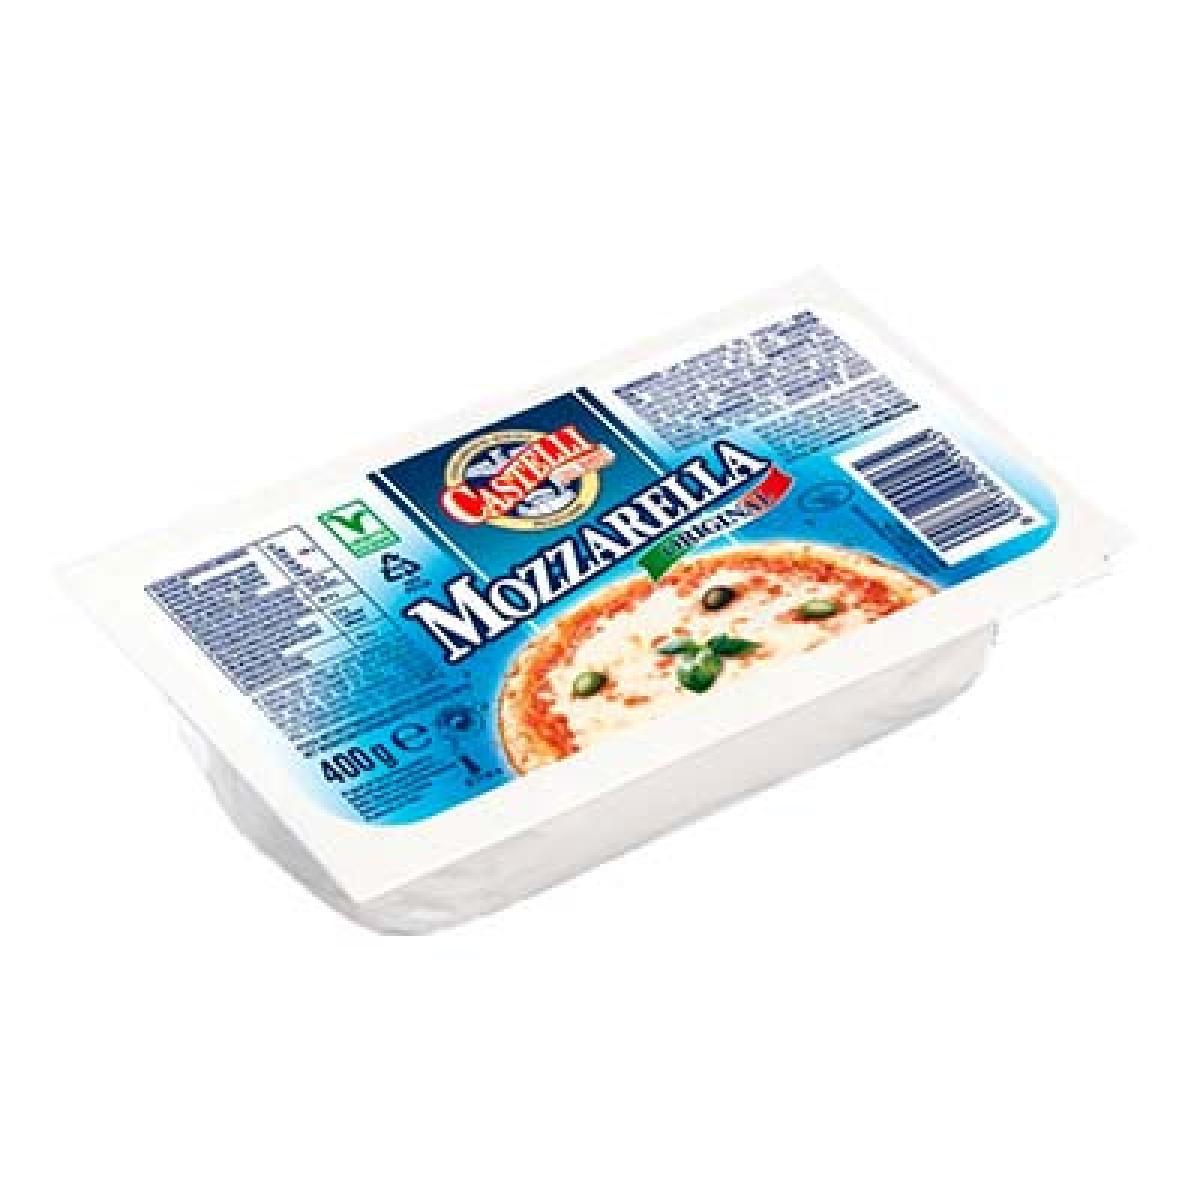 Mozzarella en bloc, Castelli (400 g)